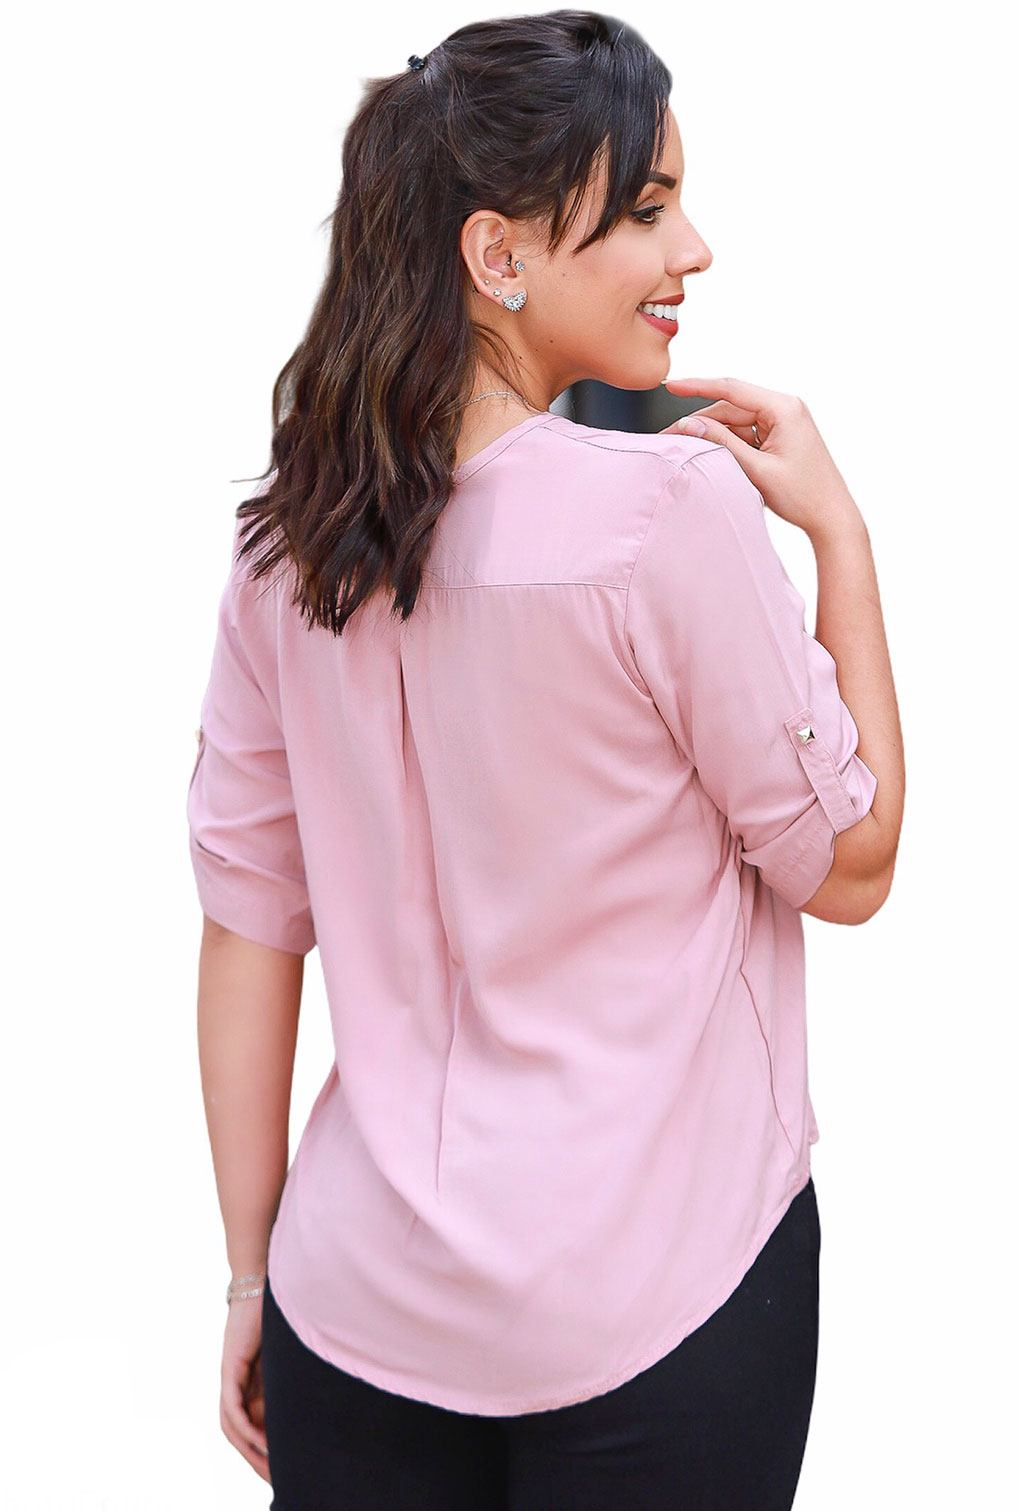 Camisa Blusa Feminina Manga Curta Social Lisa Rosa  - ModaStore | Moda Feminina